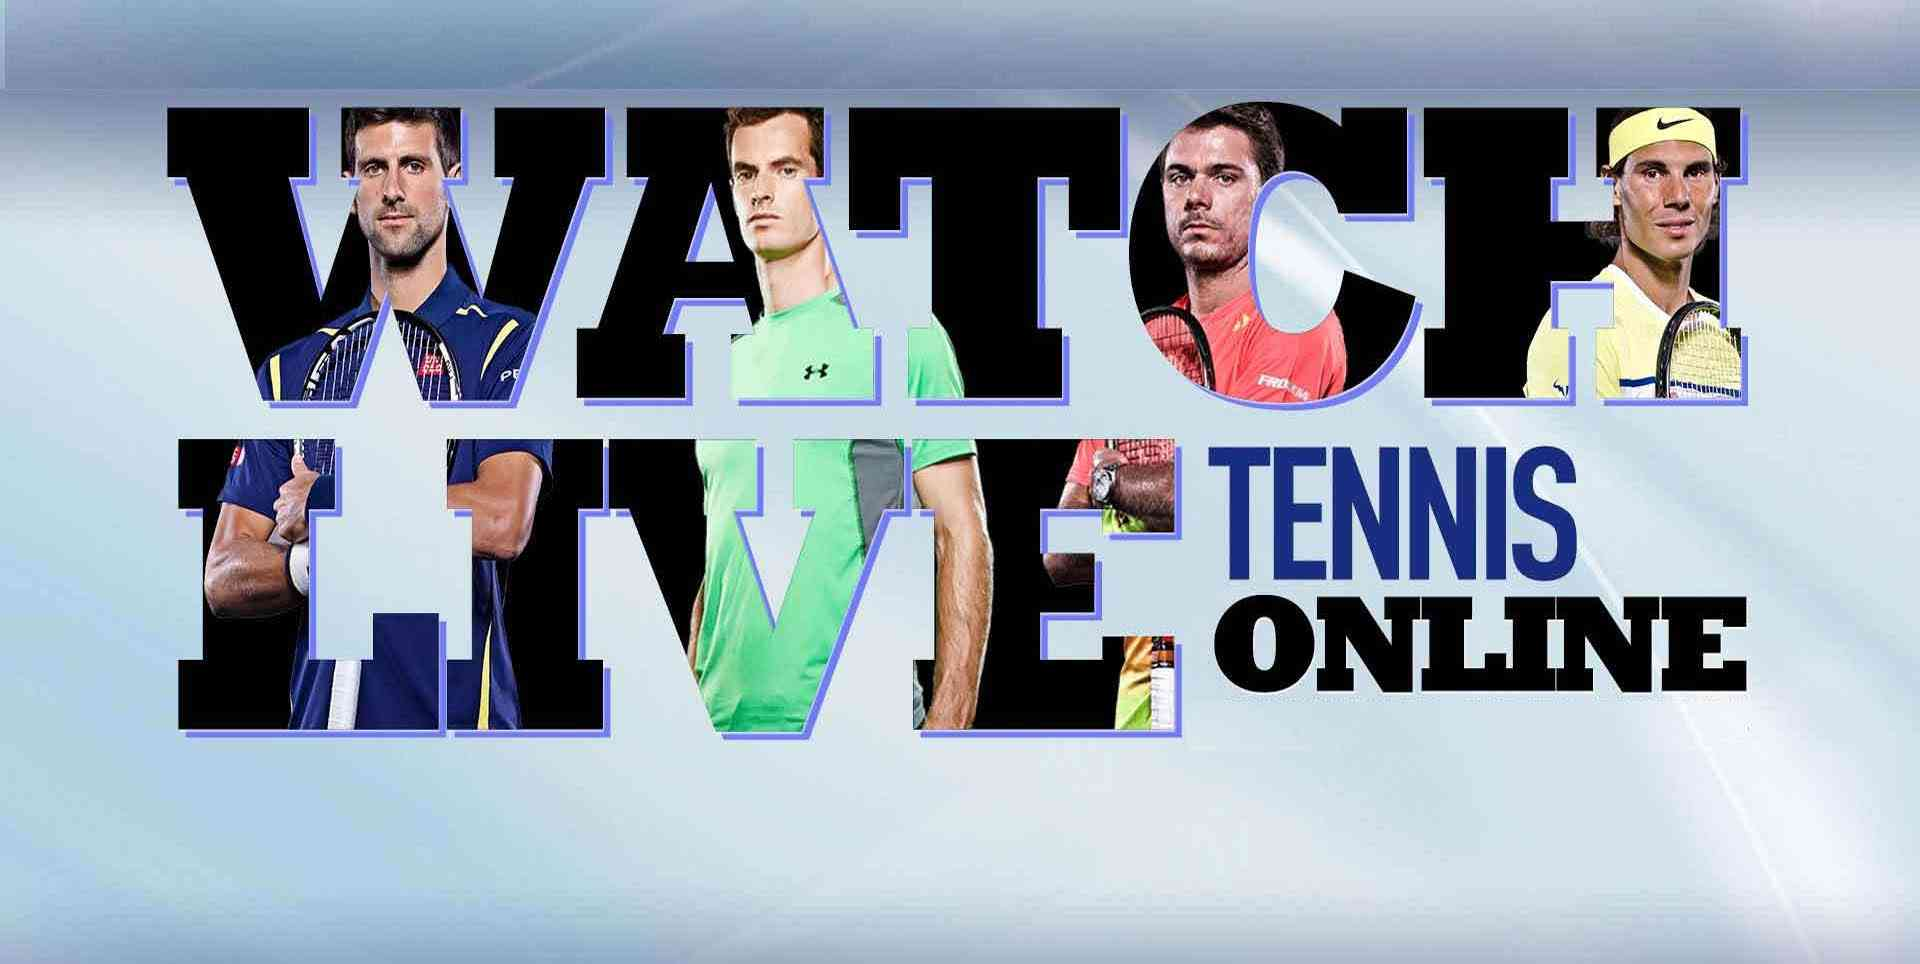 watch-a.-petkovic-vs-p.-ormaechea-quarterfinals-online-2013